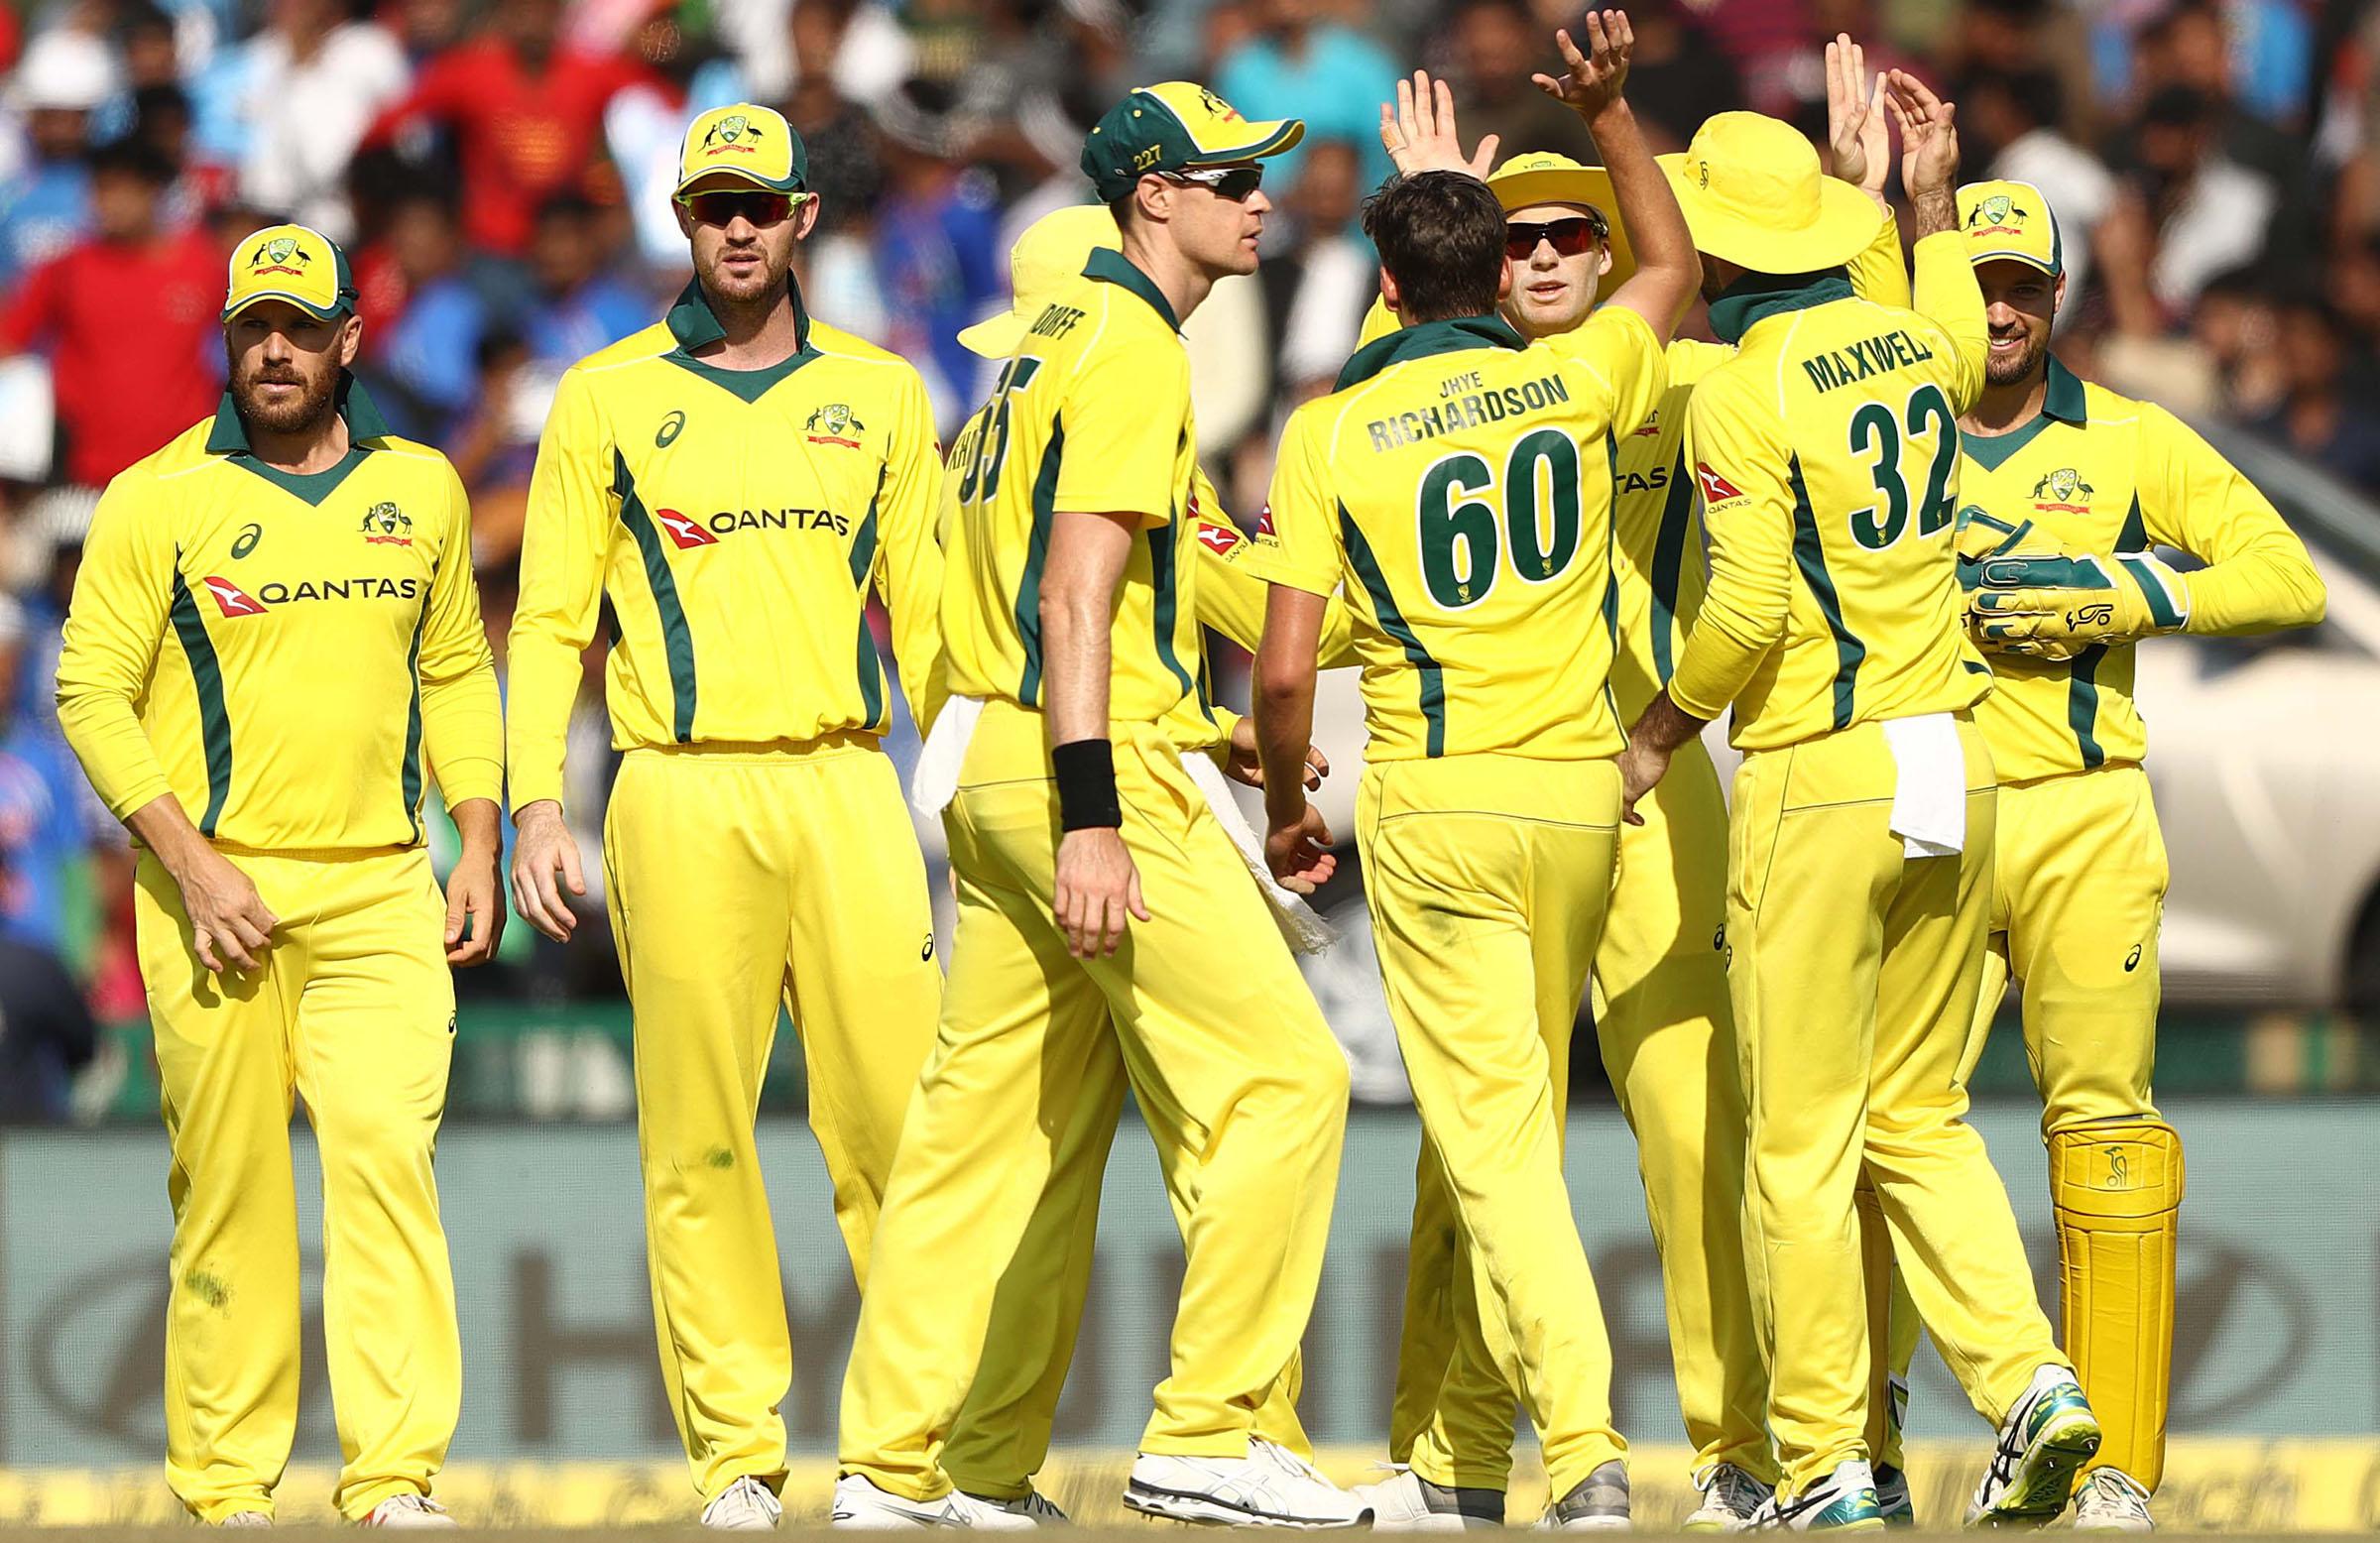 Australia's national cricket team